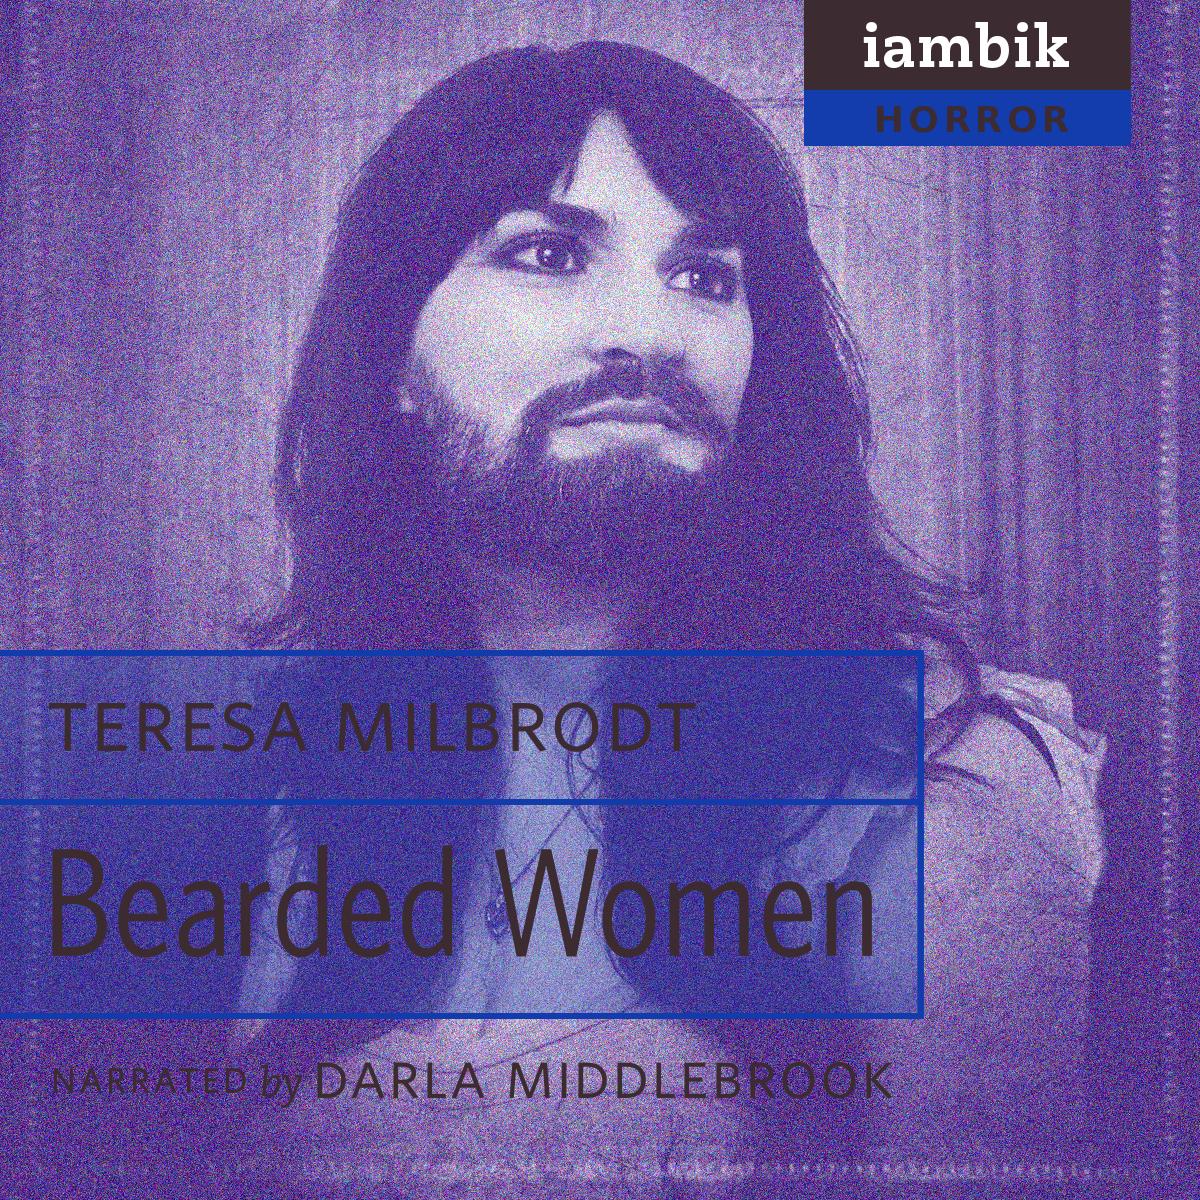 Cover photo of Bearded Women